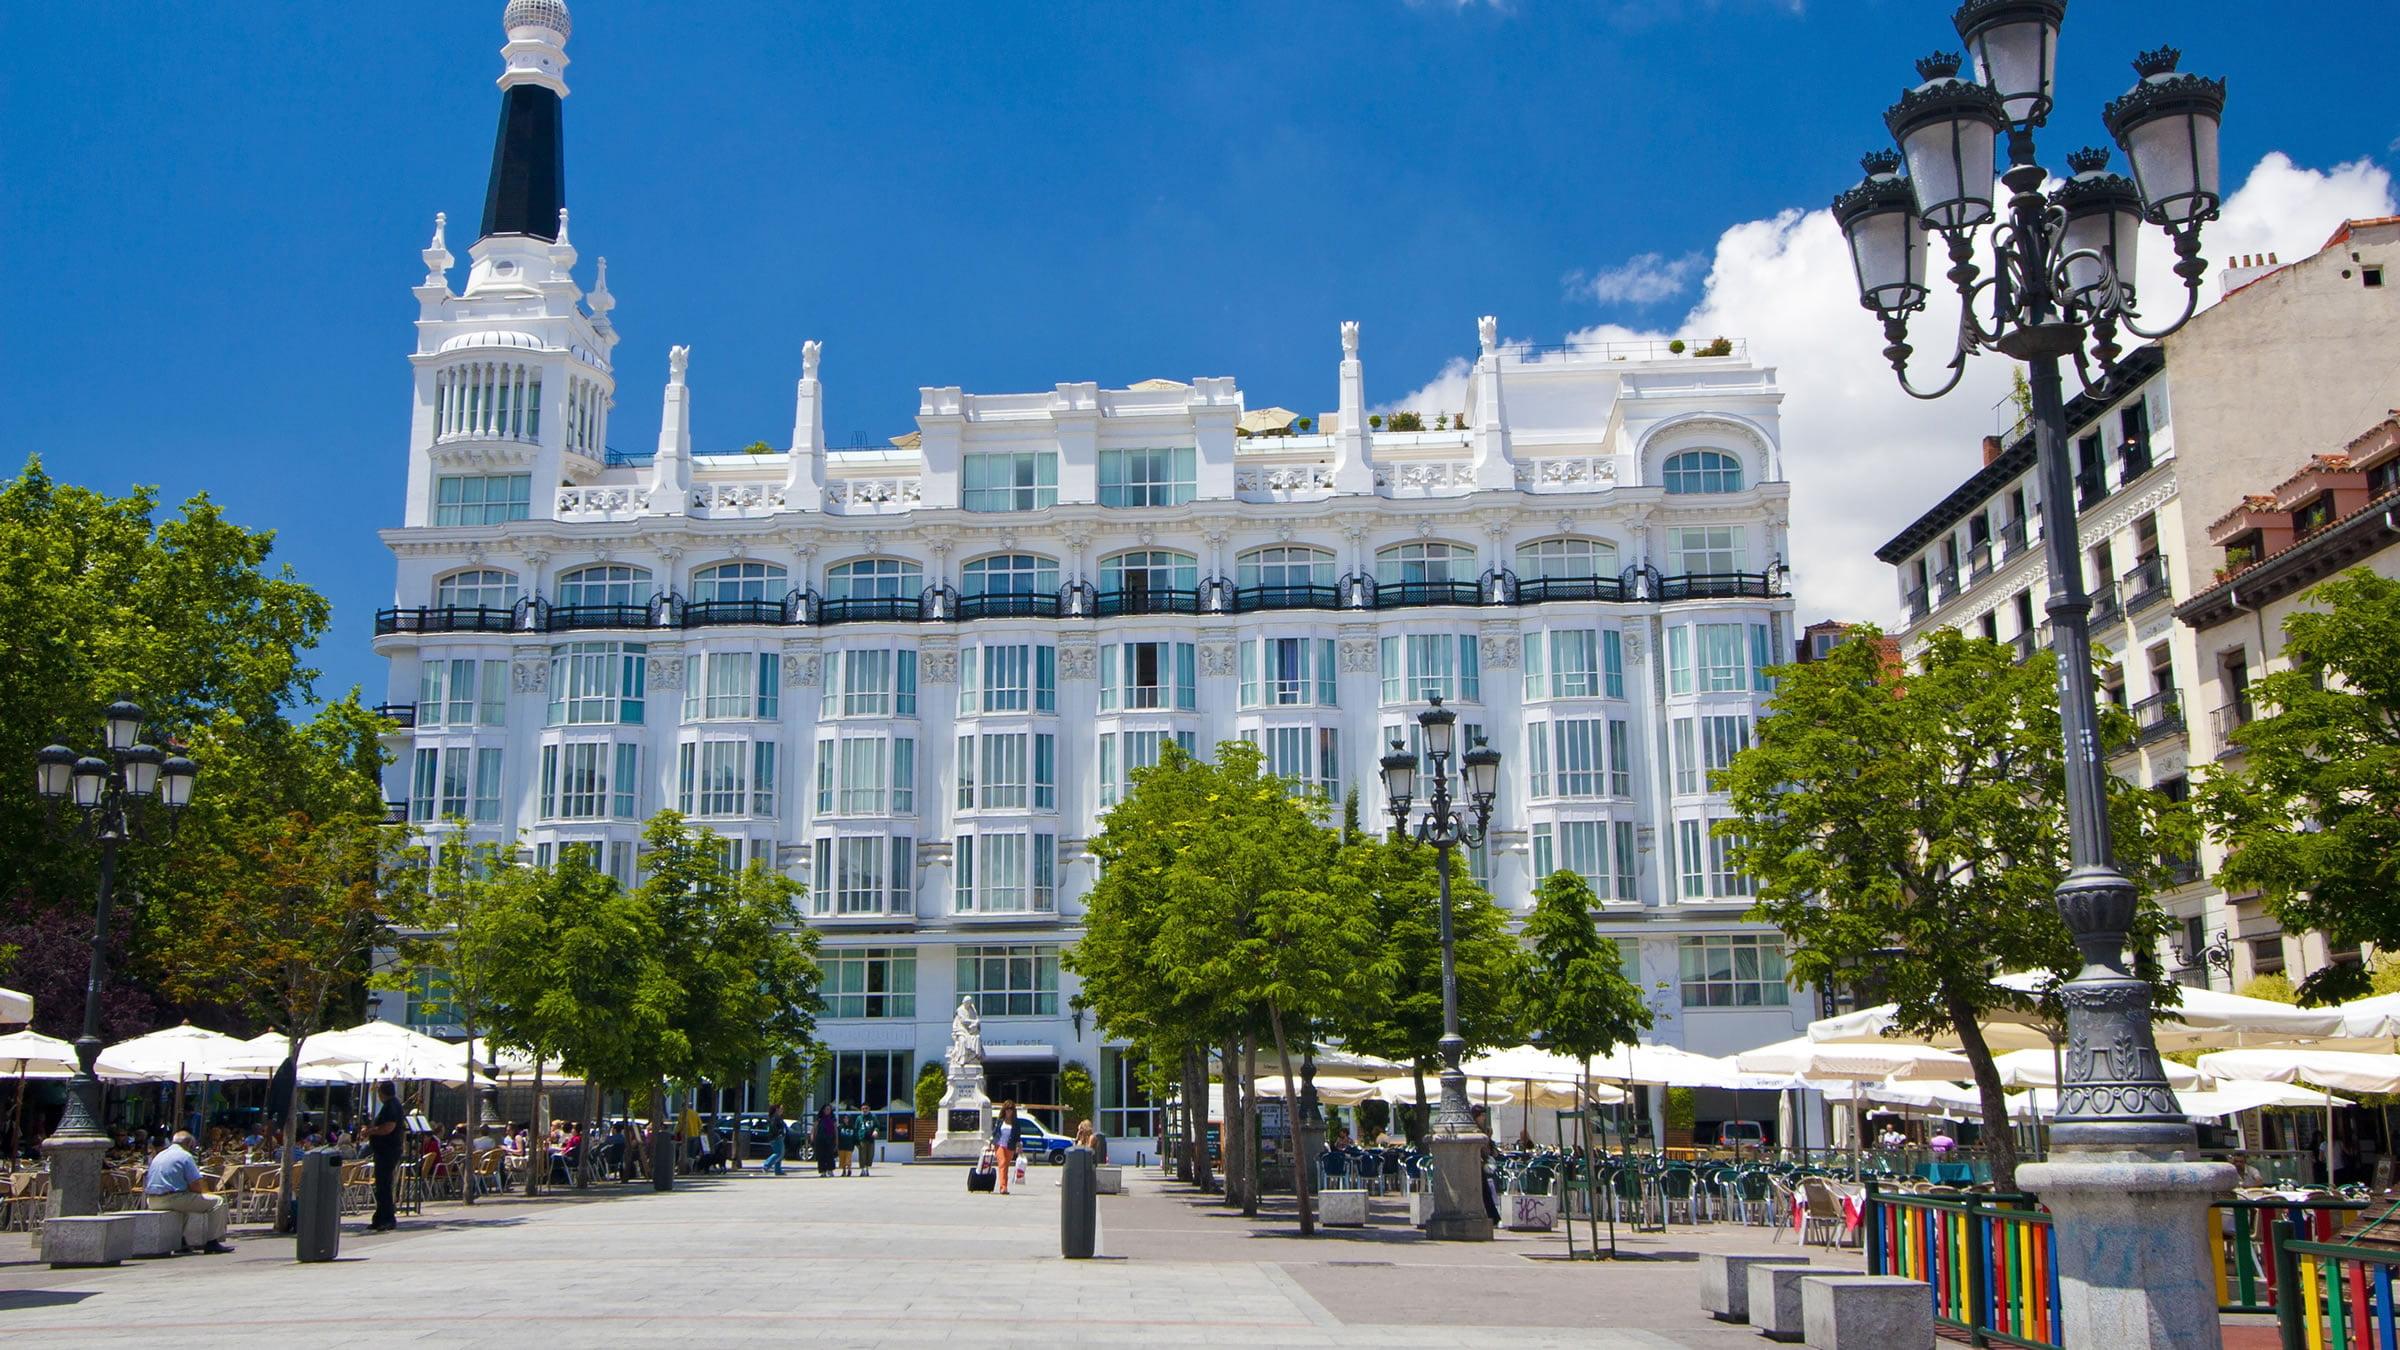 Plaza de santa ana madrid espa a - One shot hotels madrid ...